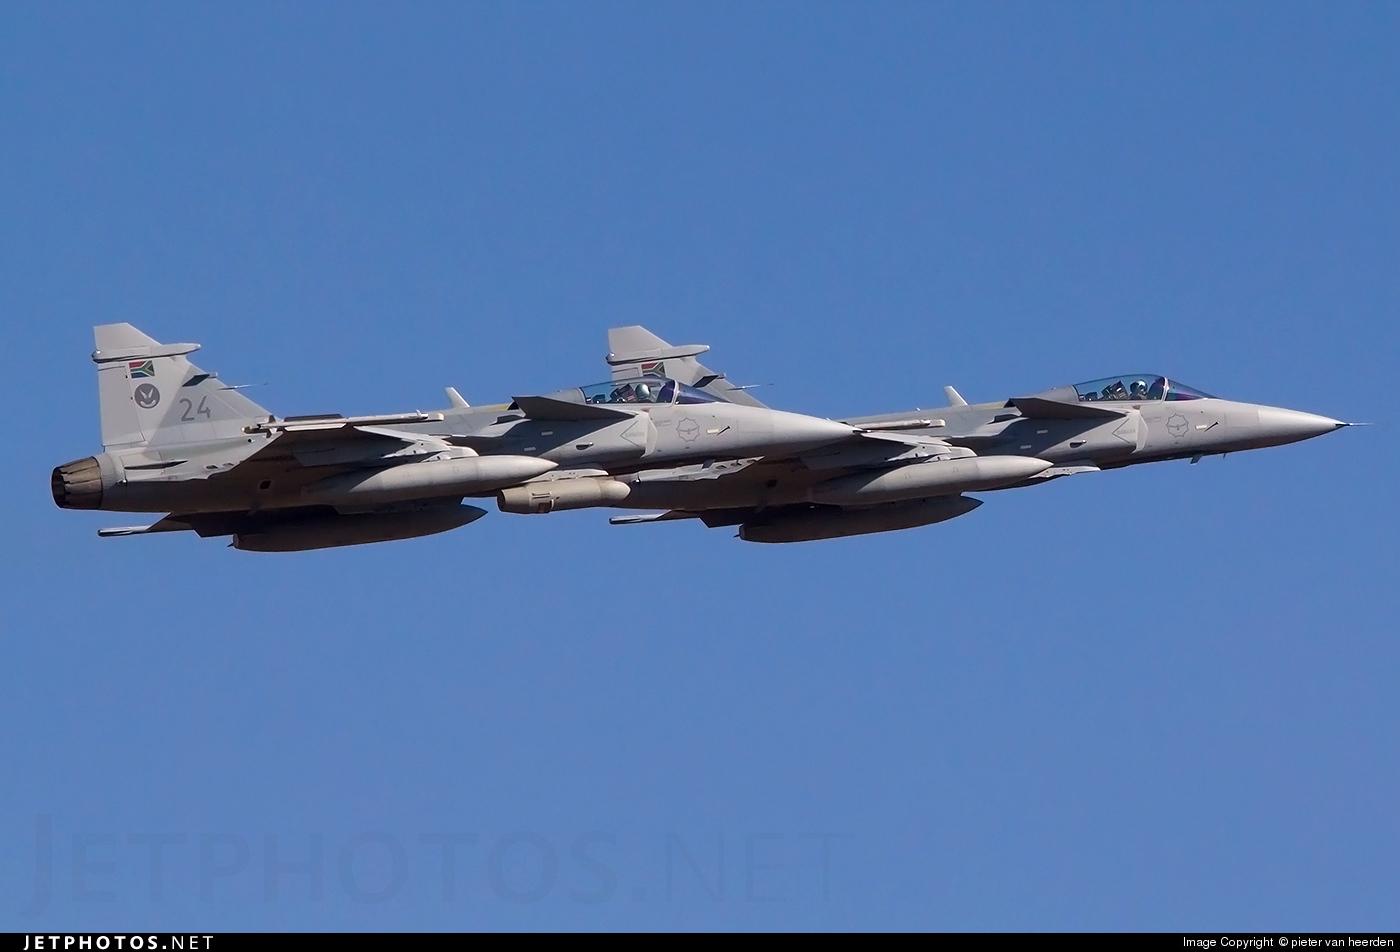 24 - Saab JAS-39C Gripen - South Africa - Air Force